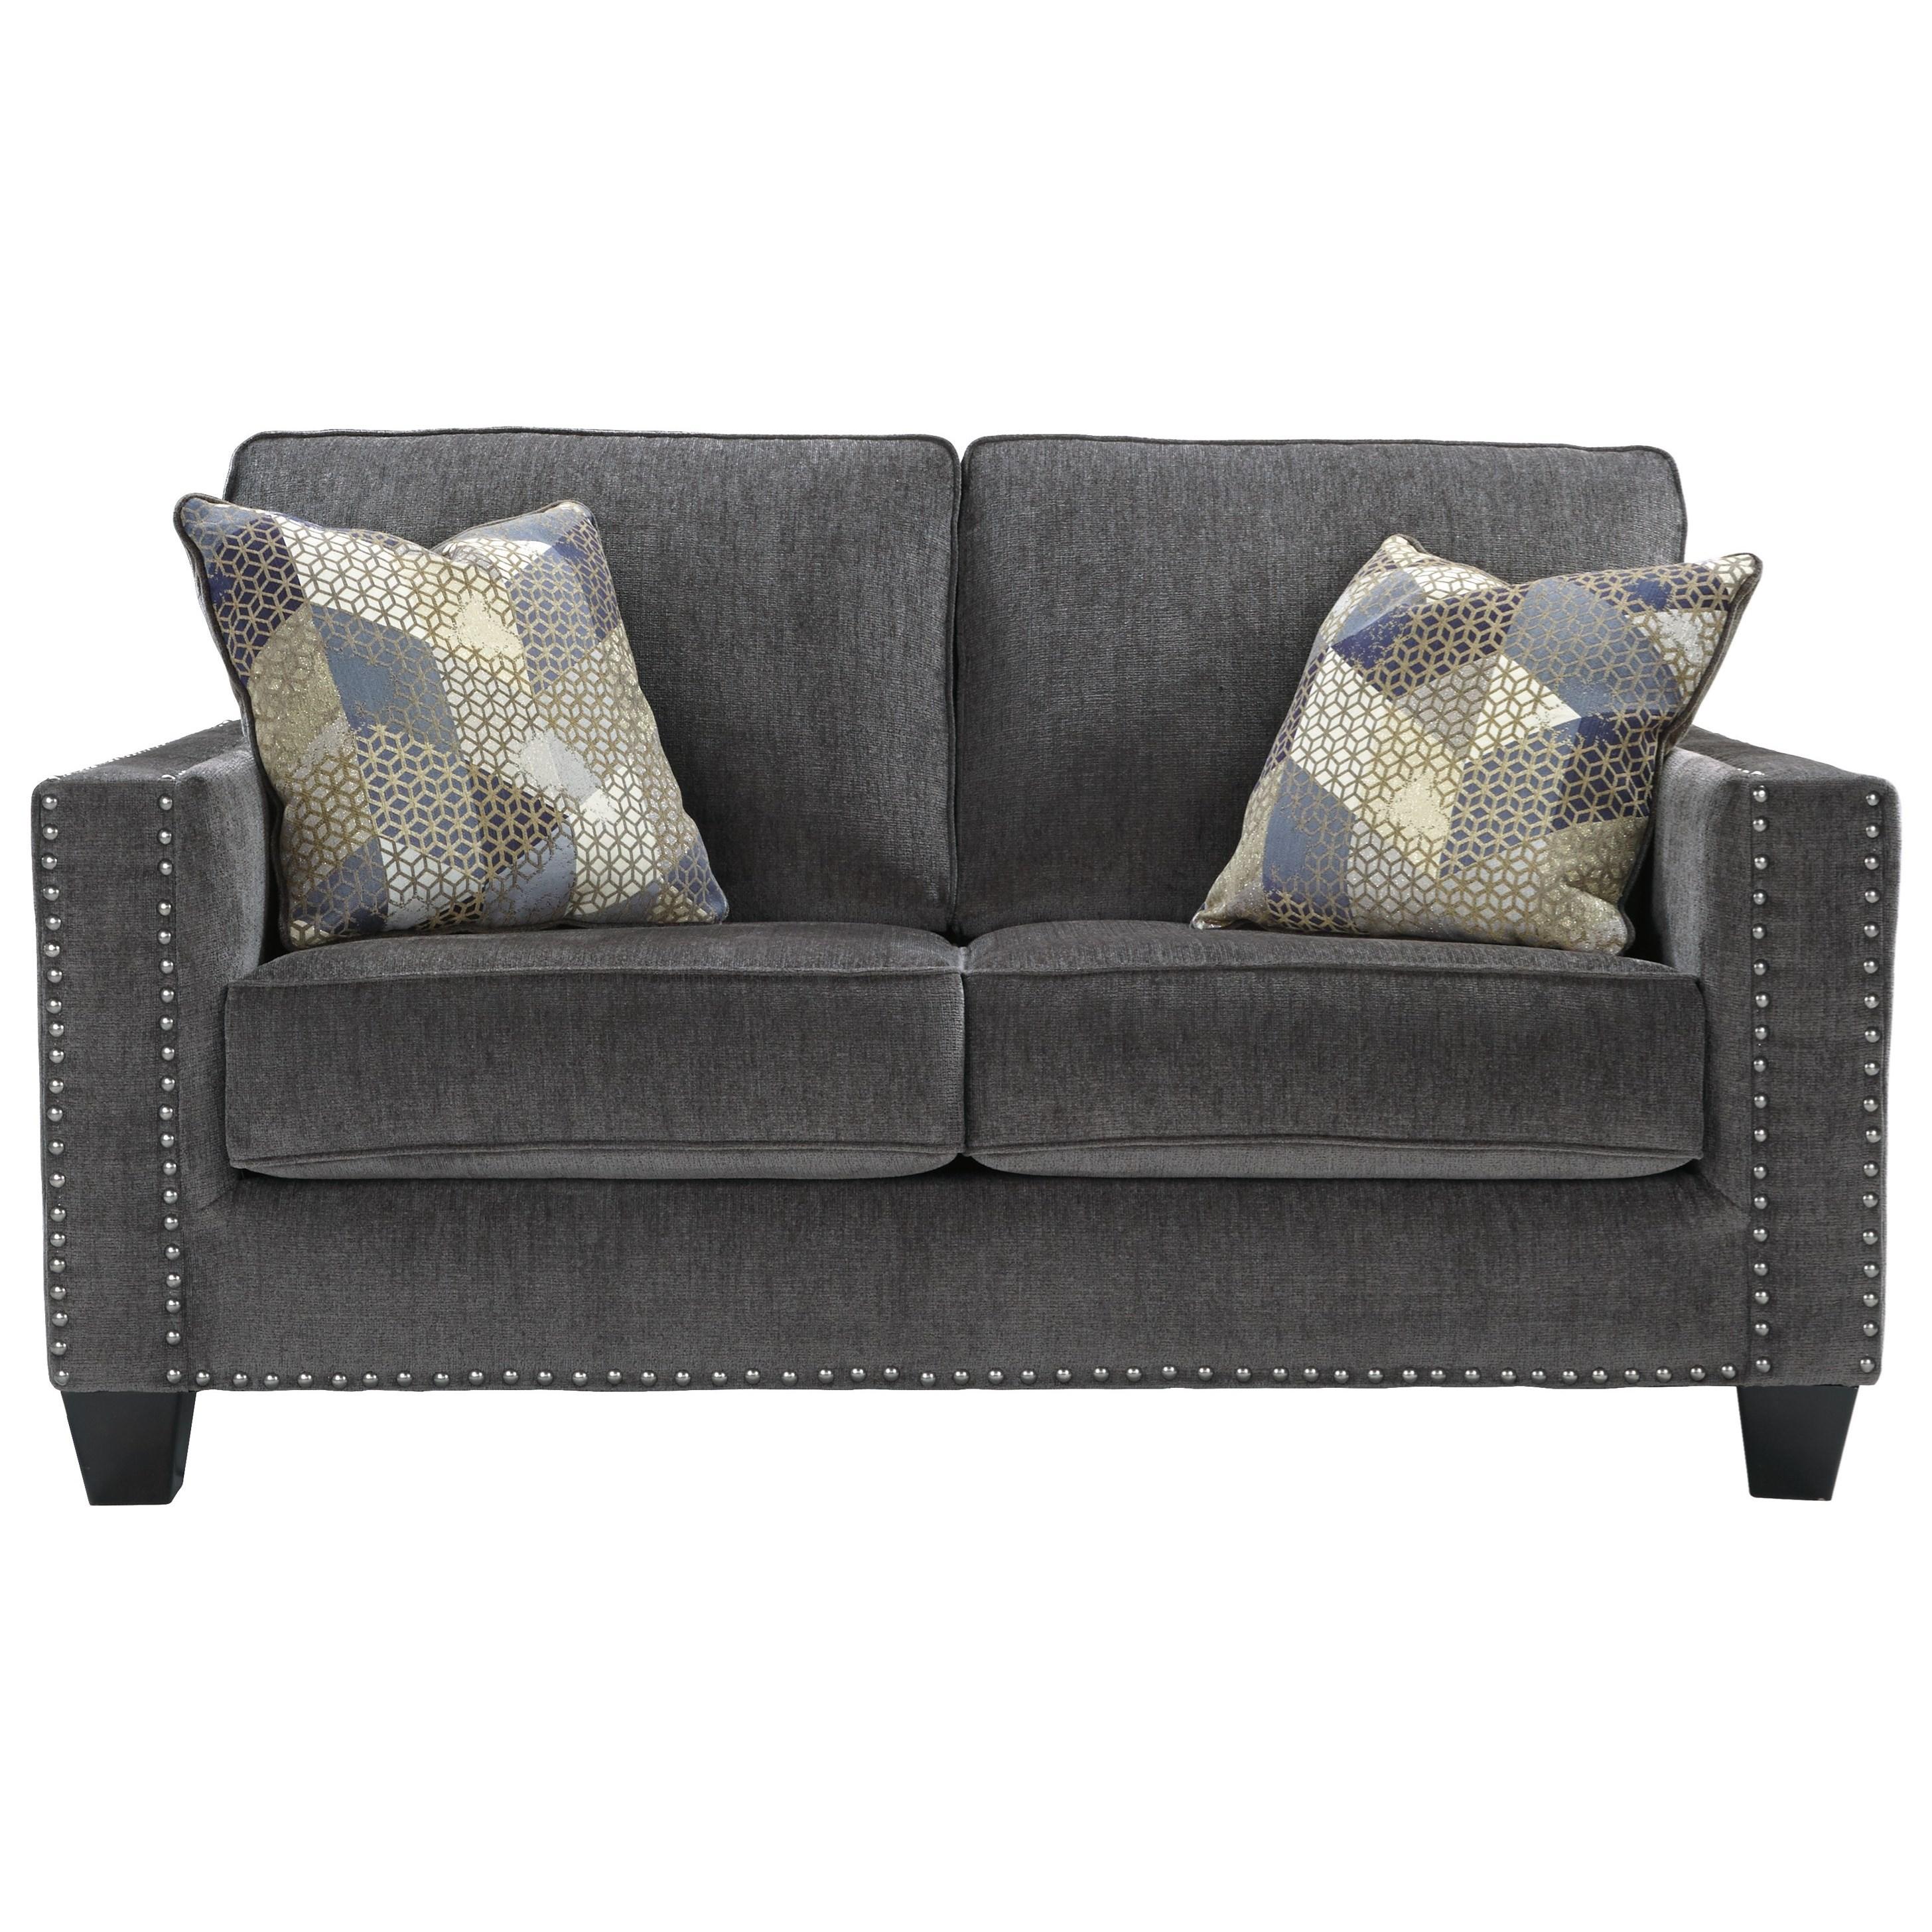 nailhead trim sofa ashley rv air sleeper benchcraft by gavril contemporary loveseat with